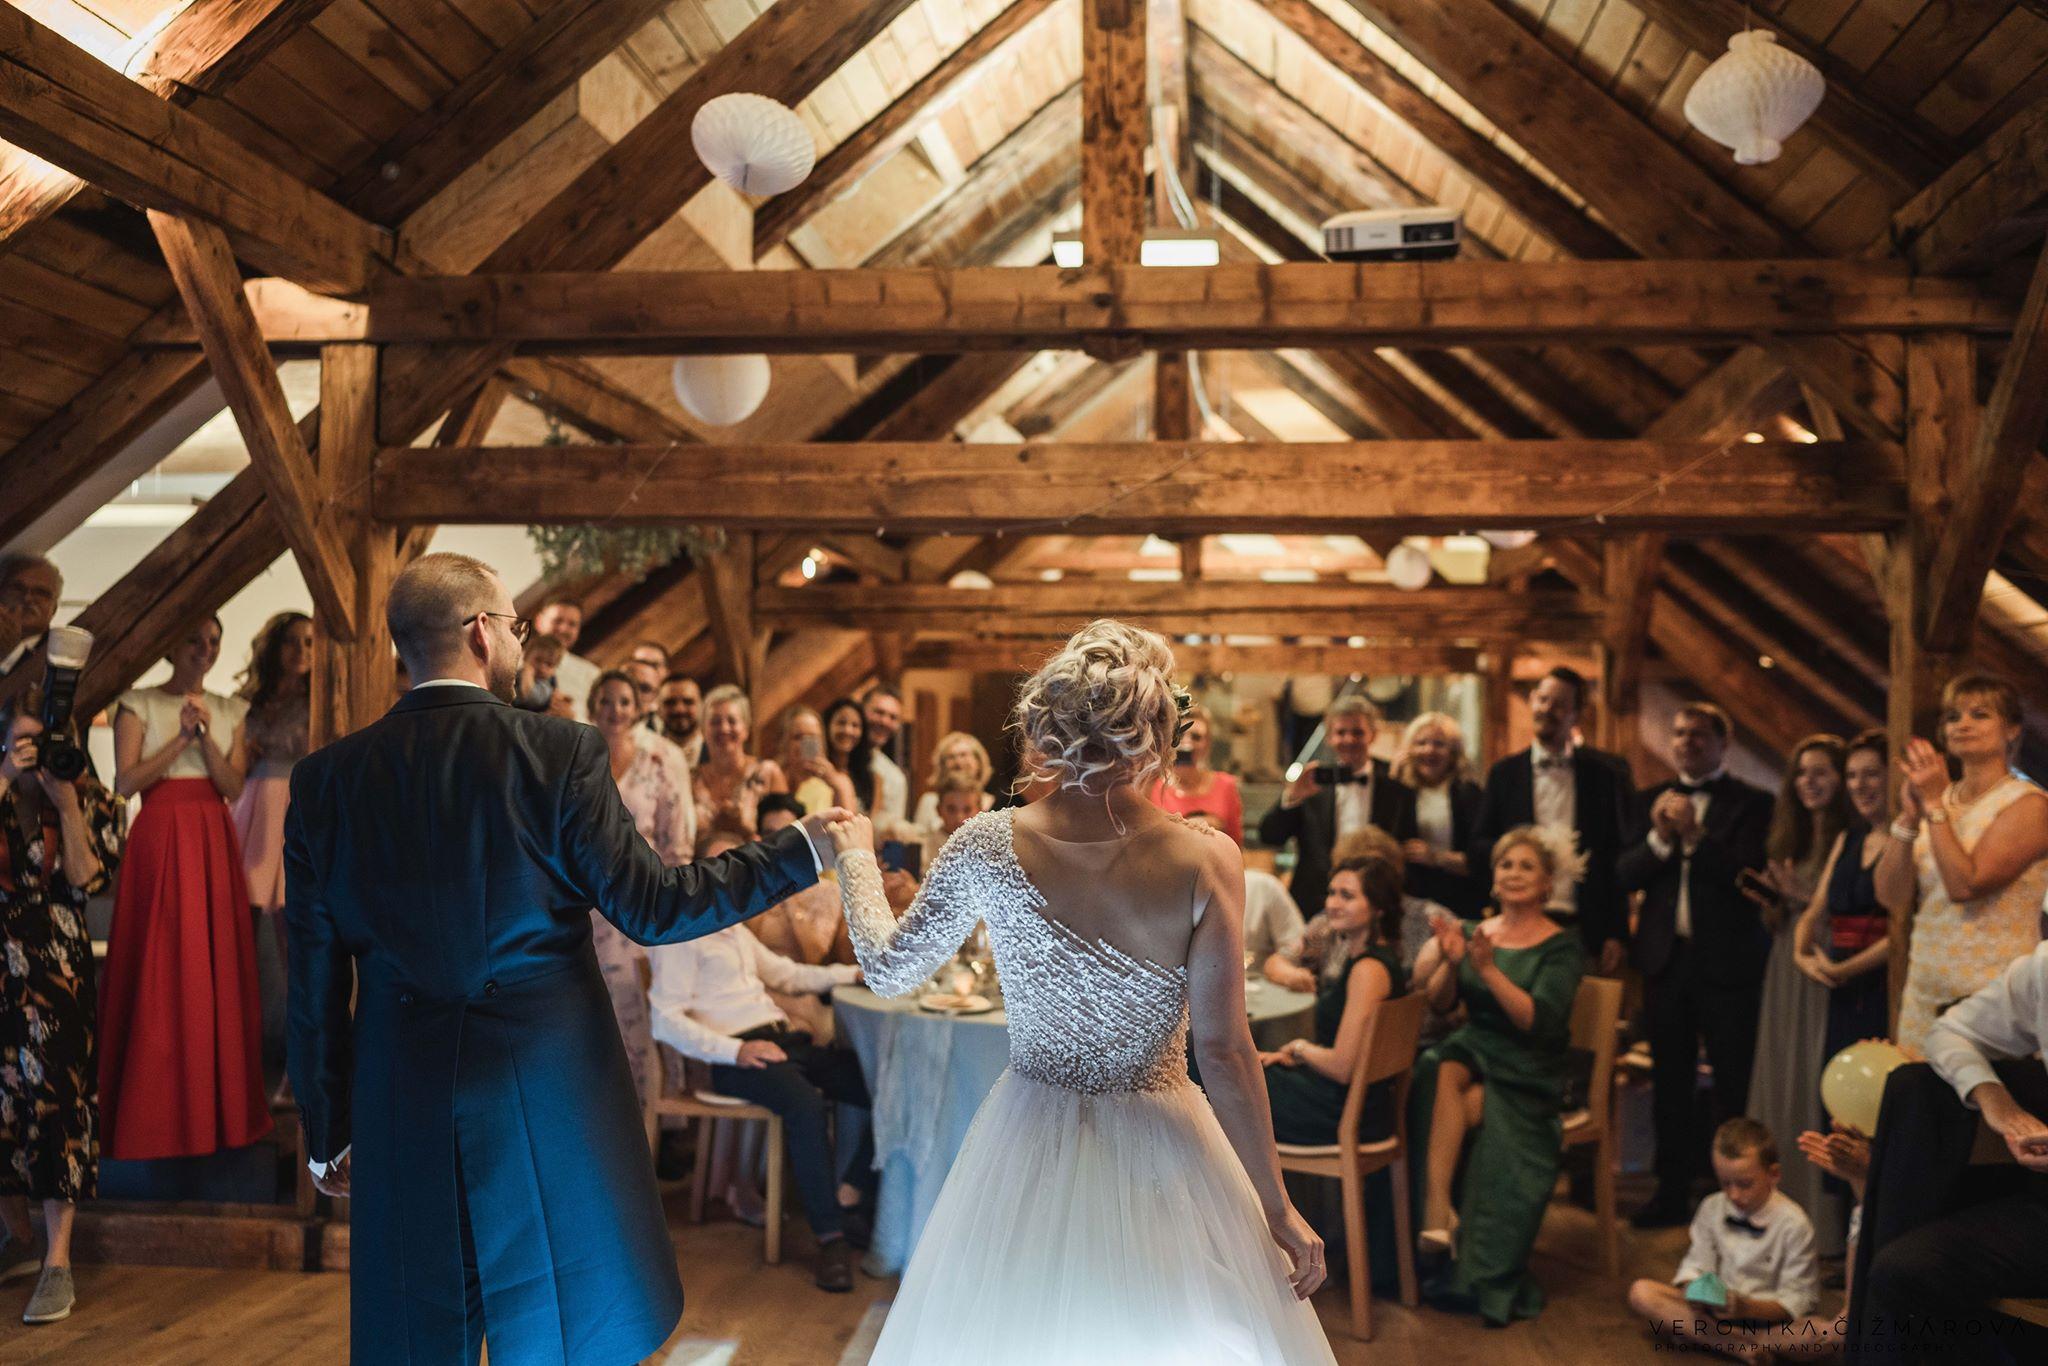 mladomanzelsky-tanec-svadba-weddingjpg